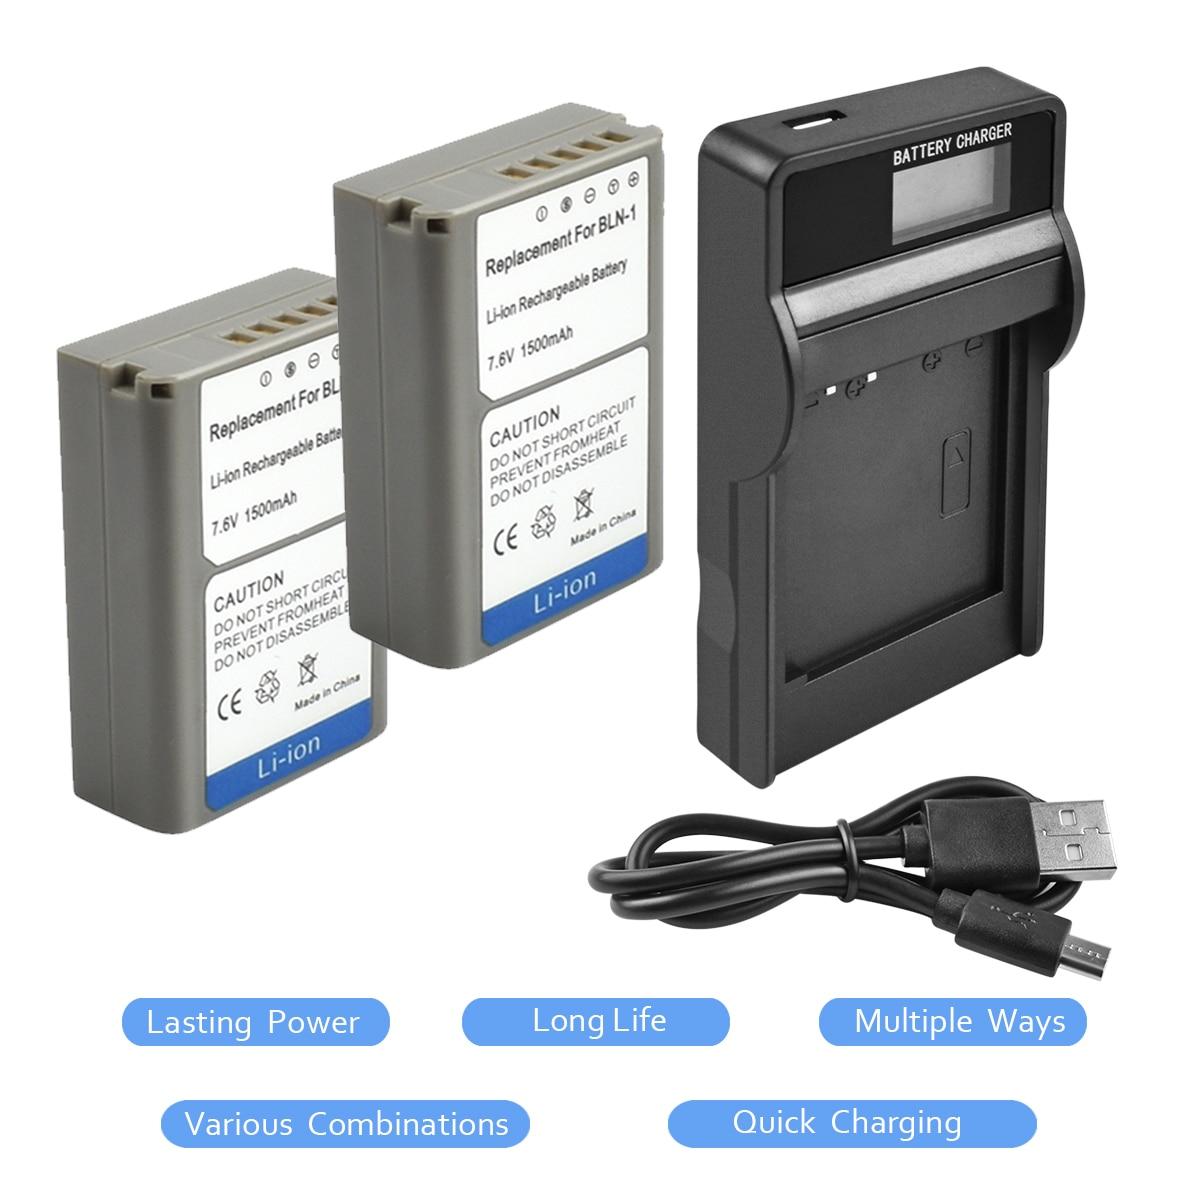 Digital Batterien Streng Ohd Original 1600 Mah Bln-1 Ps-bln1 Bln 1 Digital Kamera Batterie Für Olympus E-m5 Em5 Omd Om-d